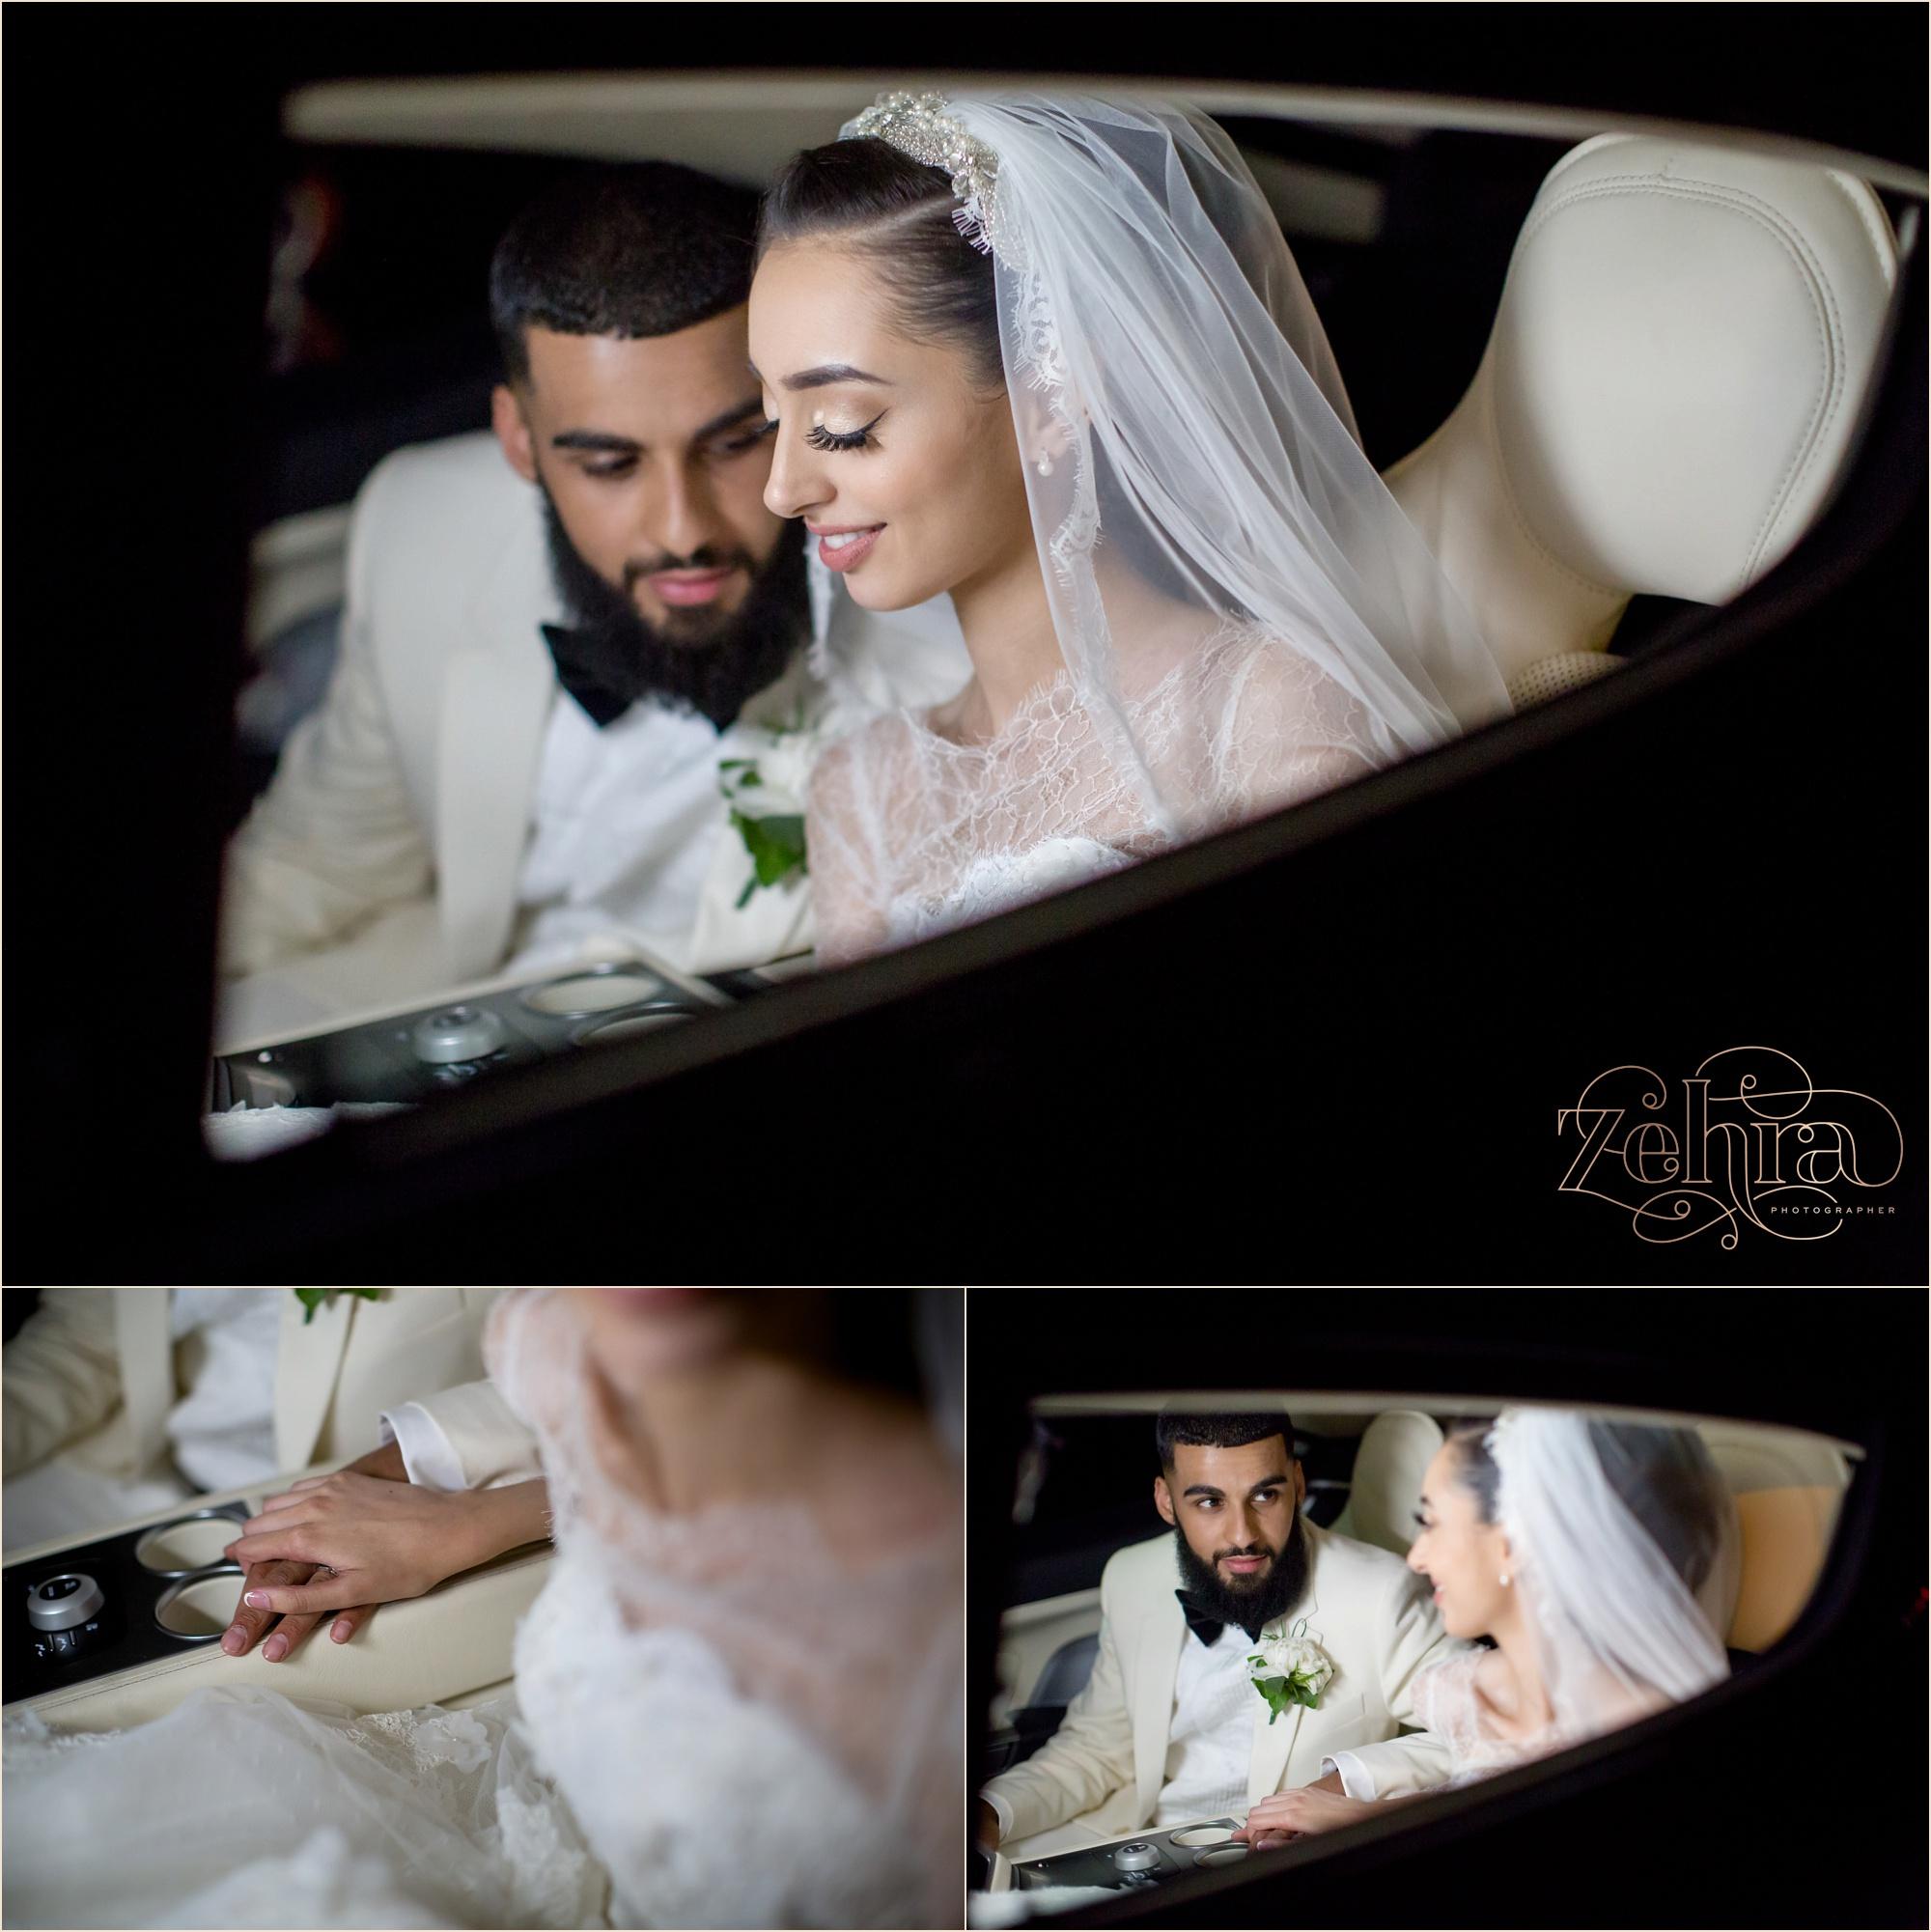 jasira manchester wedding photographer_0047.jpg